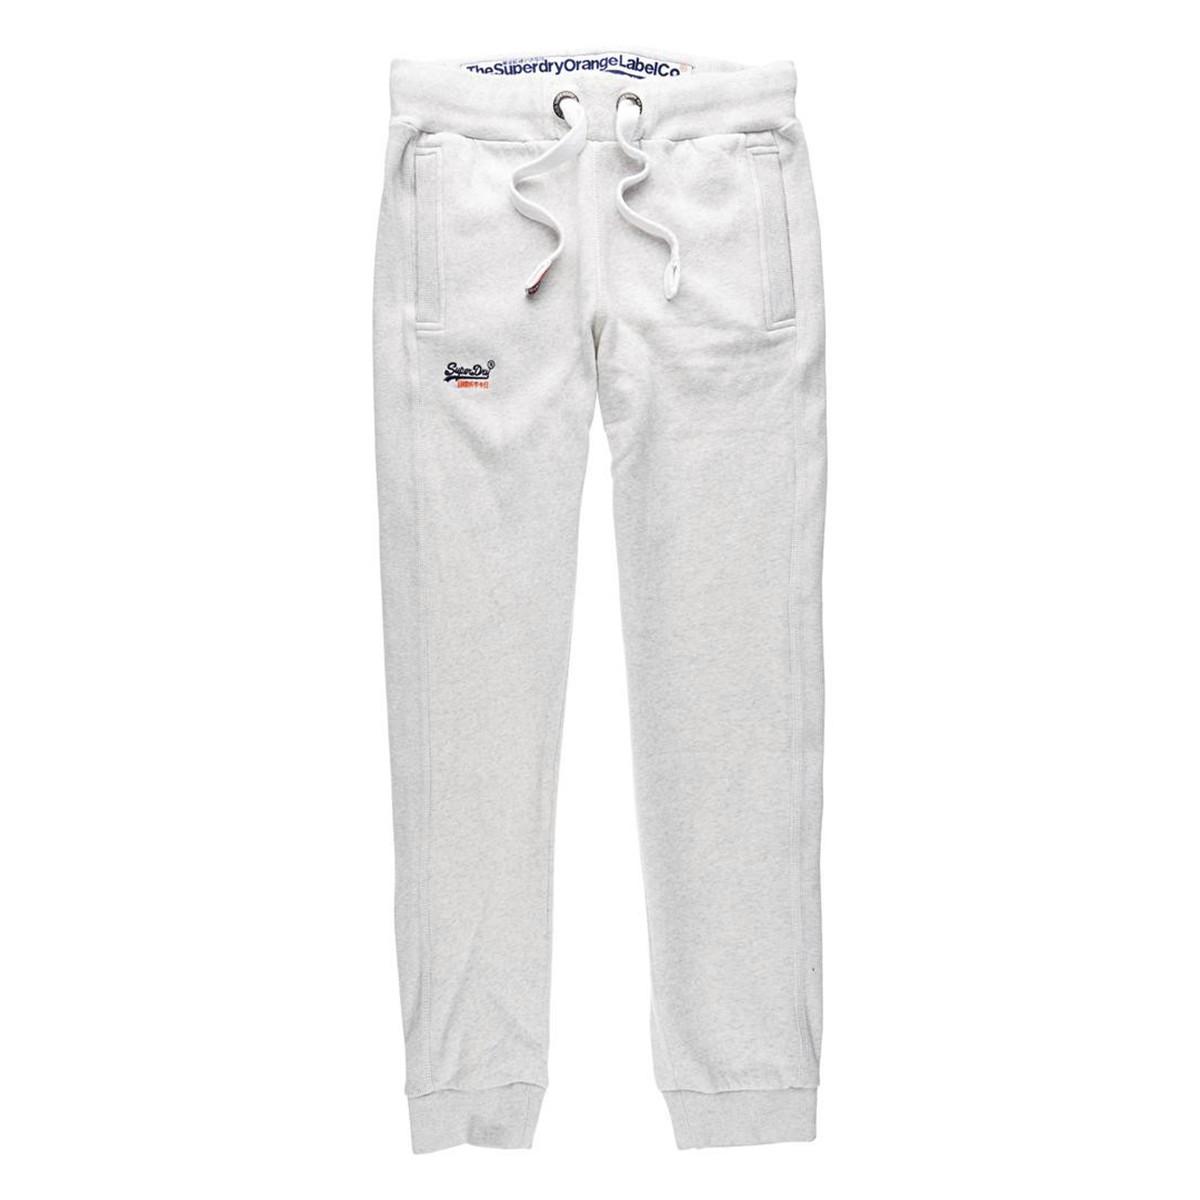 Orange Label Slim Pantalon Homme SUPERDRY BLANC pas cher